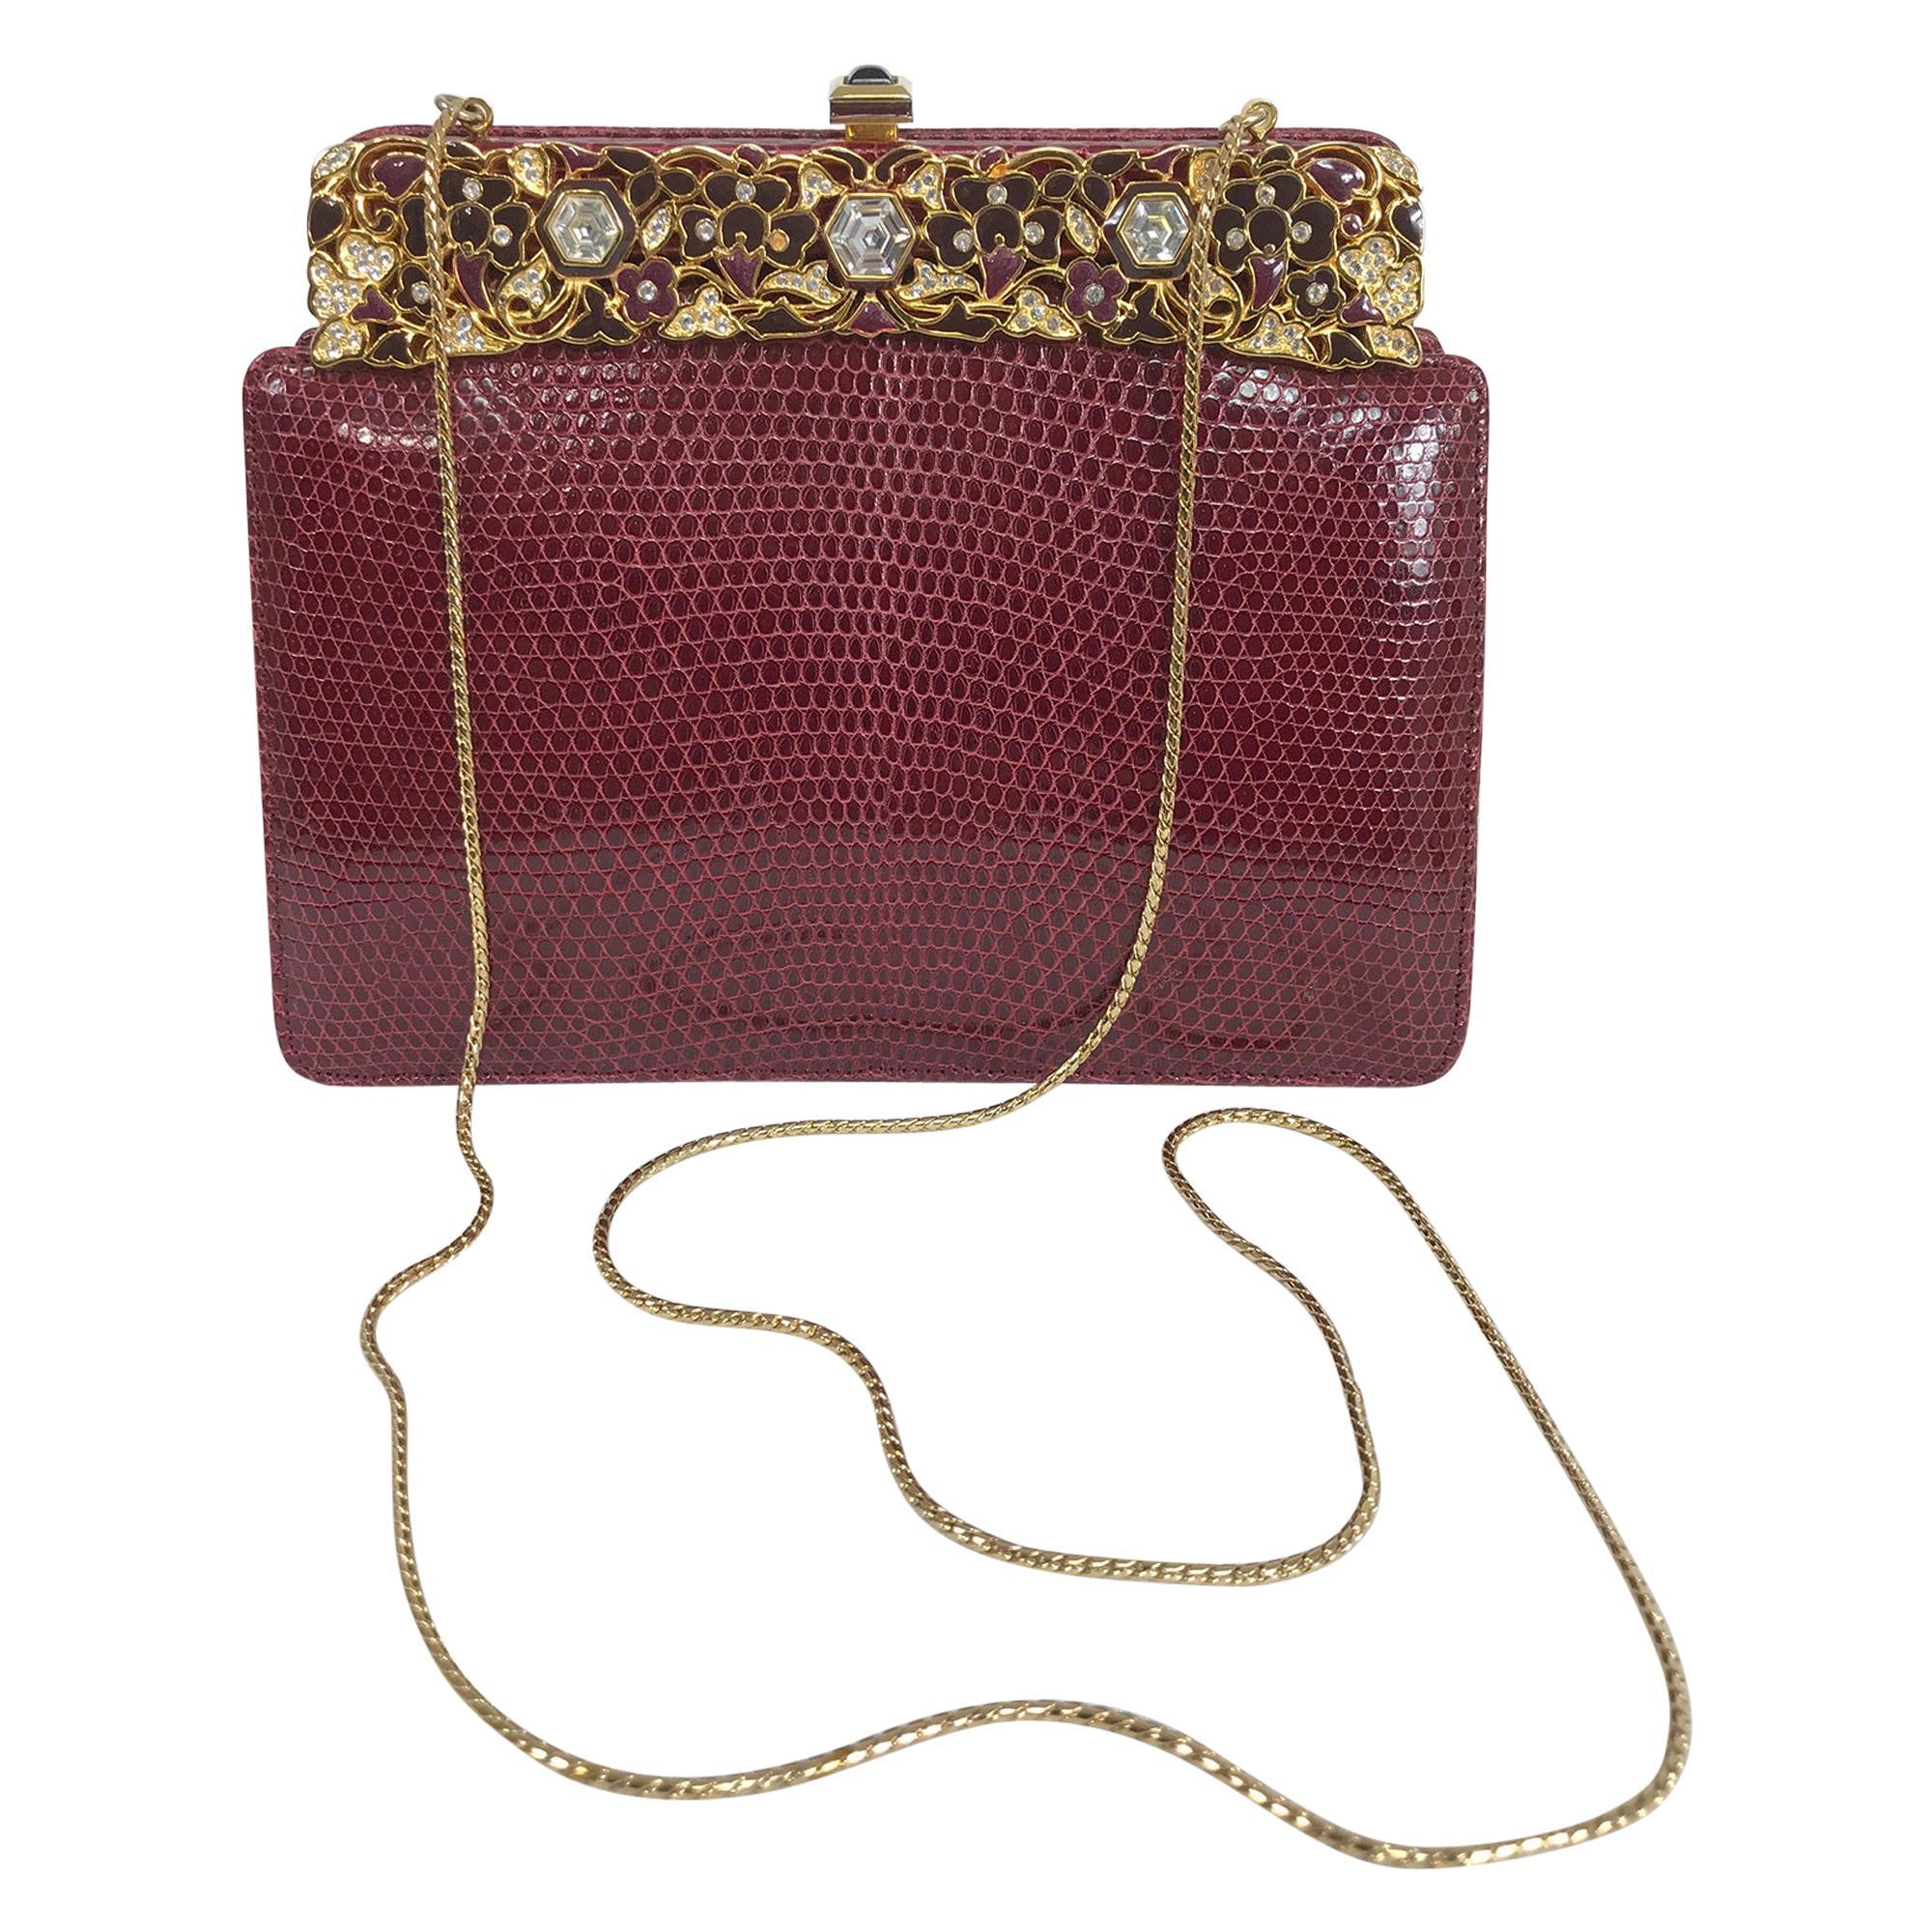 Judith Leiber Jewel Clasp Burgundy Lizard Clutch Shoulder Bag with Accessories